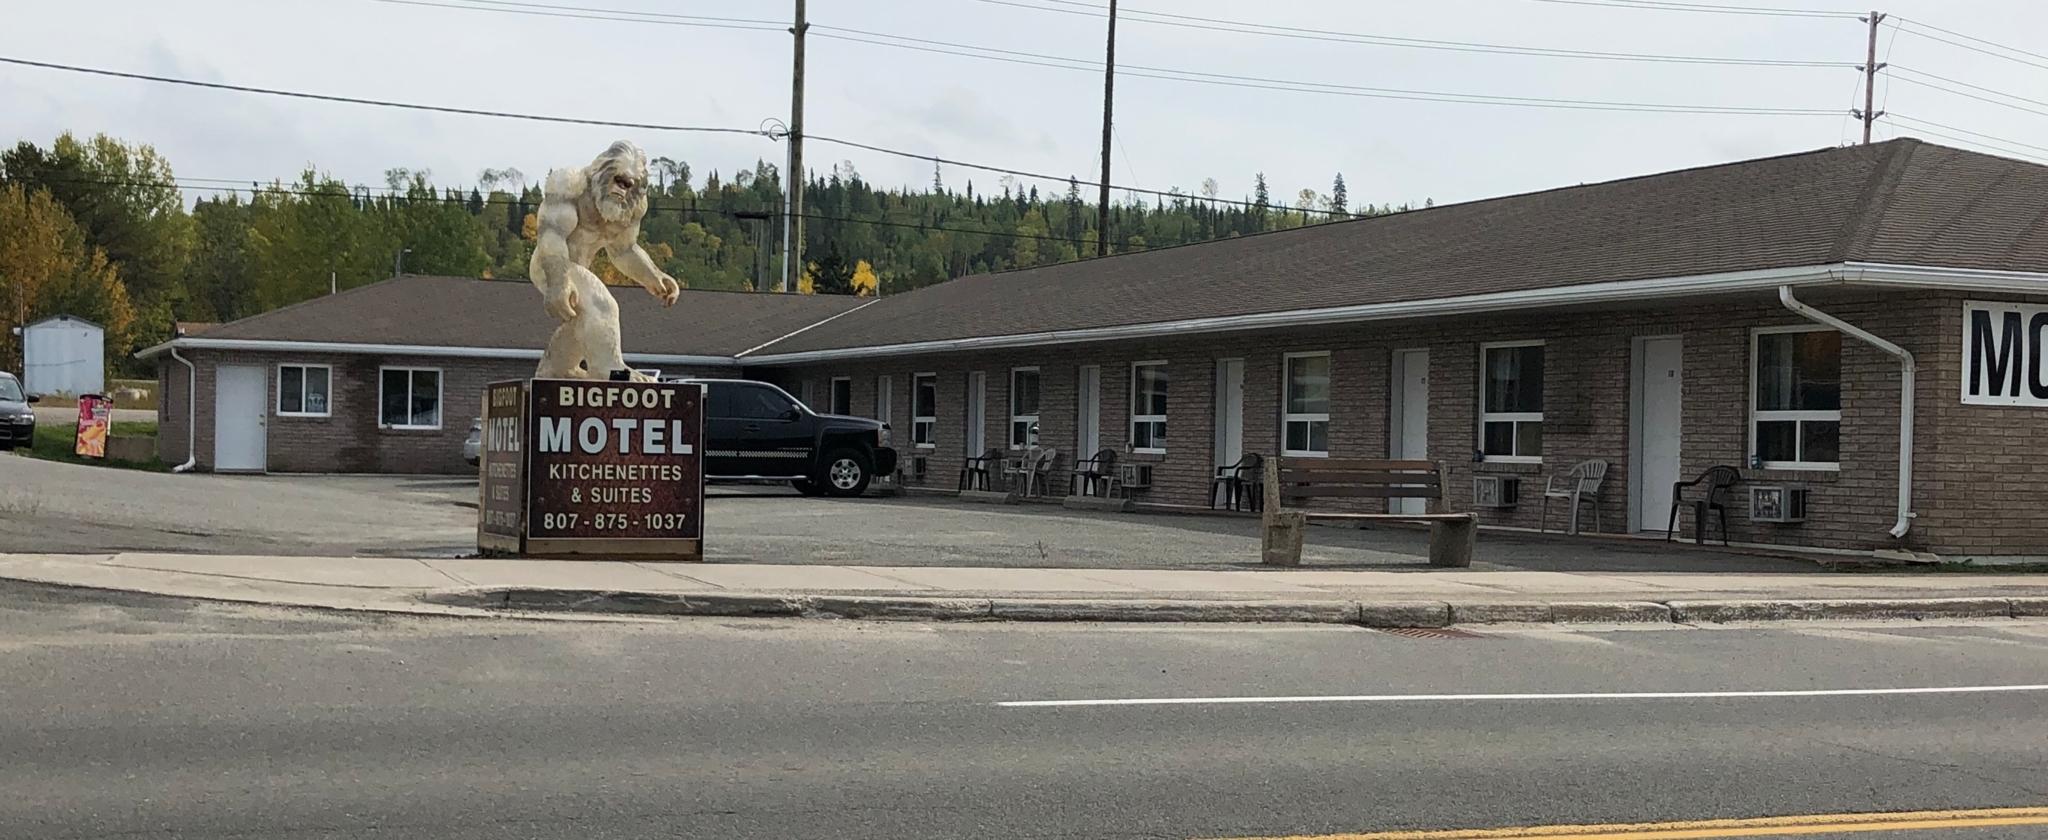 Bigfoot Motel Kitchenette & Suites